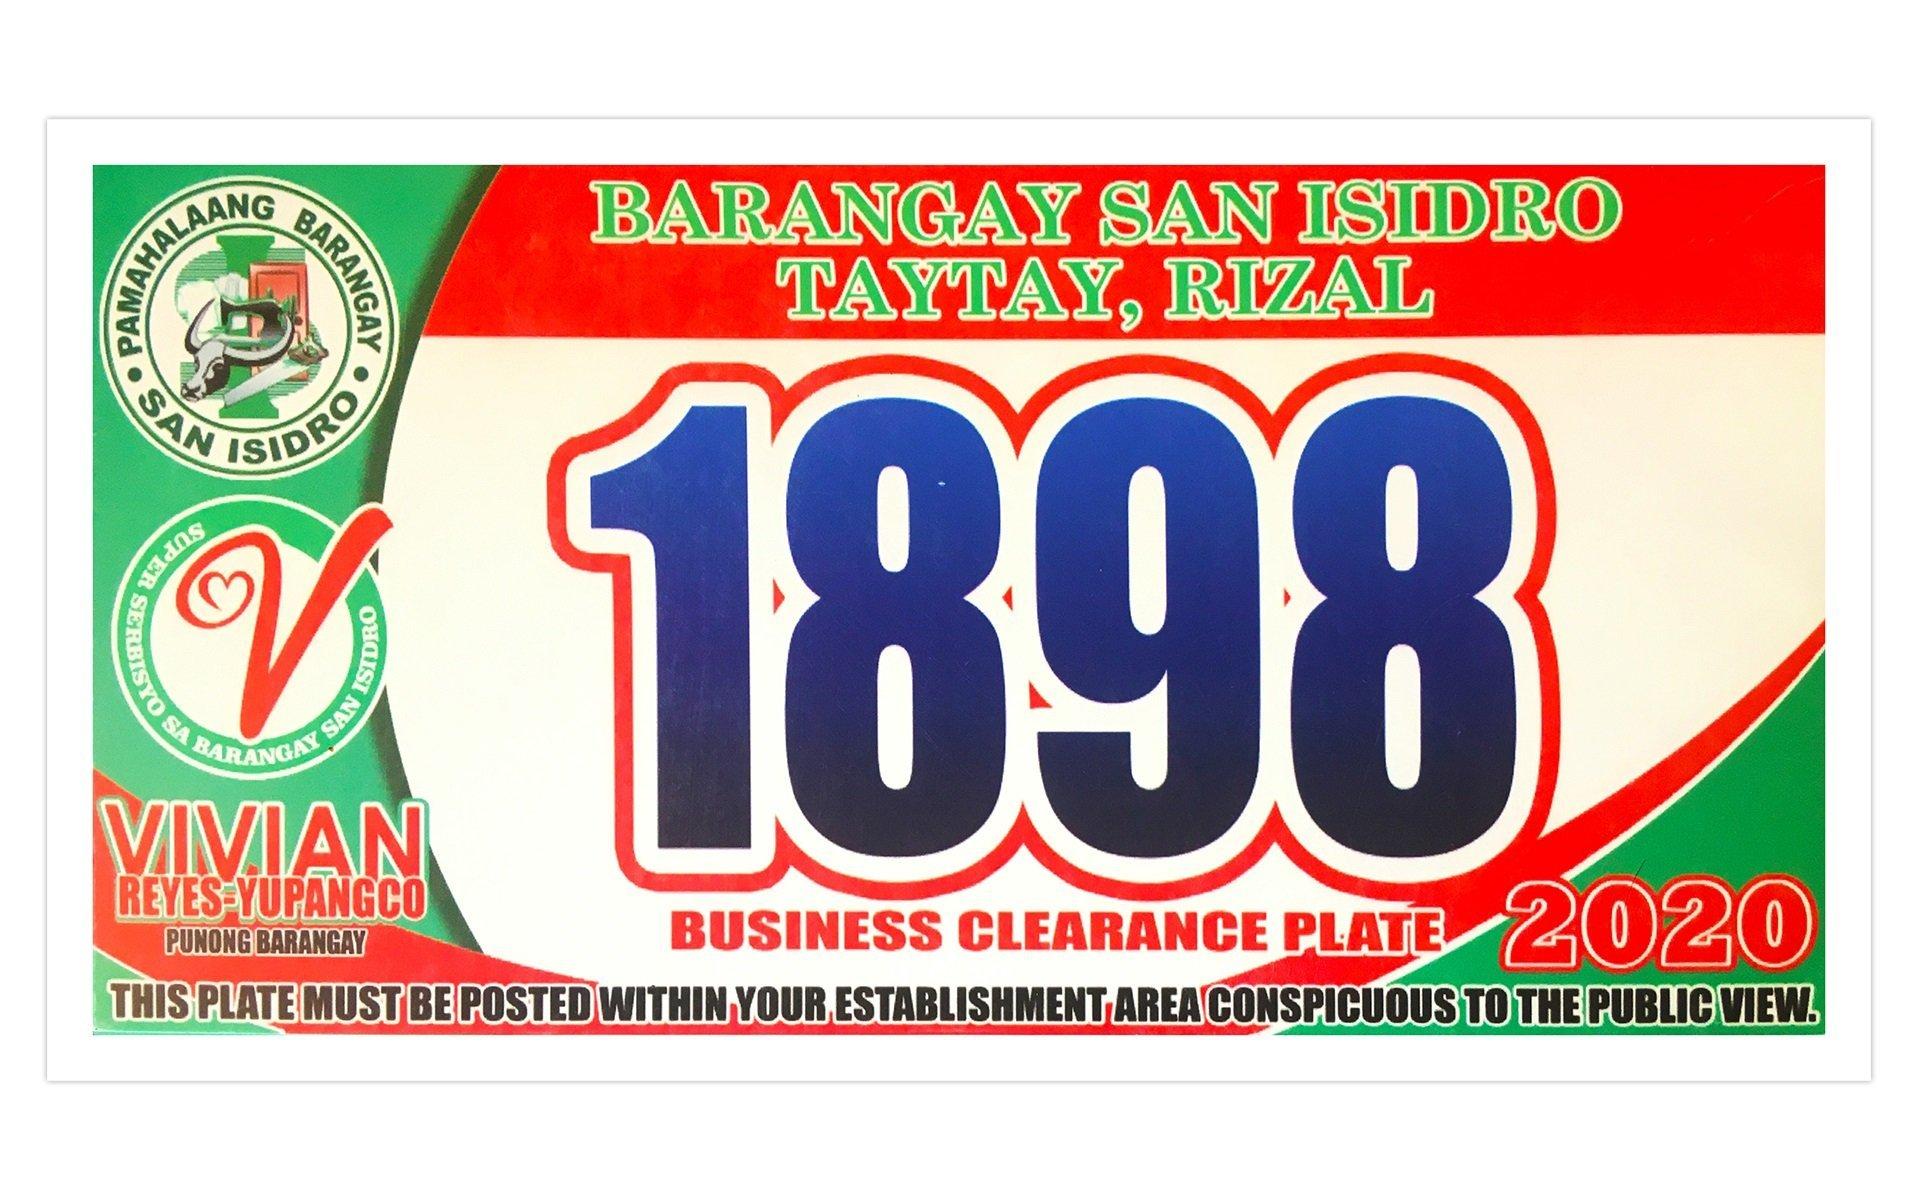 License Plate Brgy. San Isidro